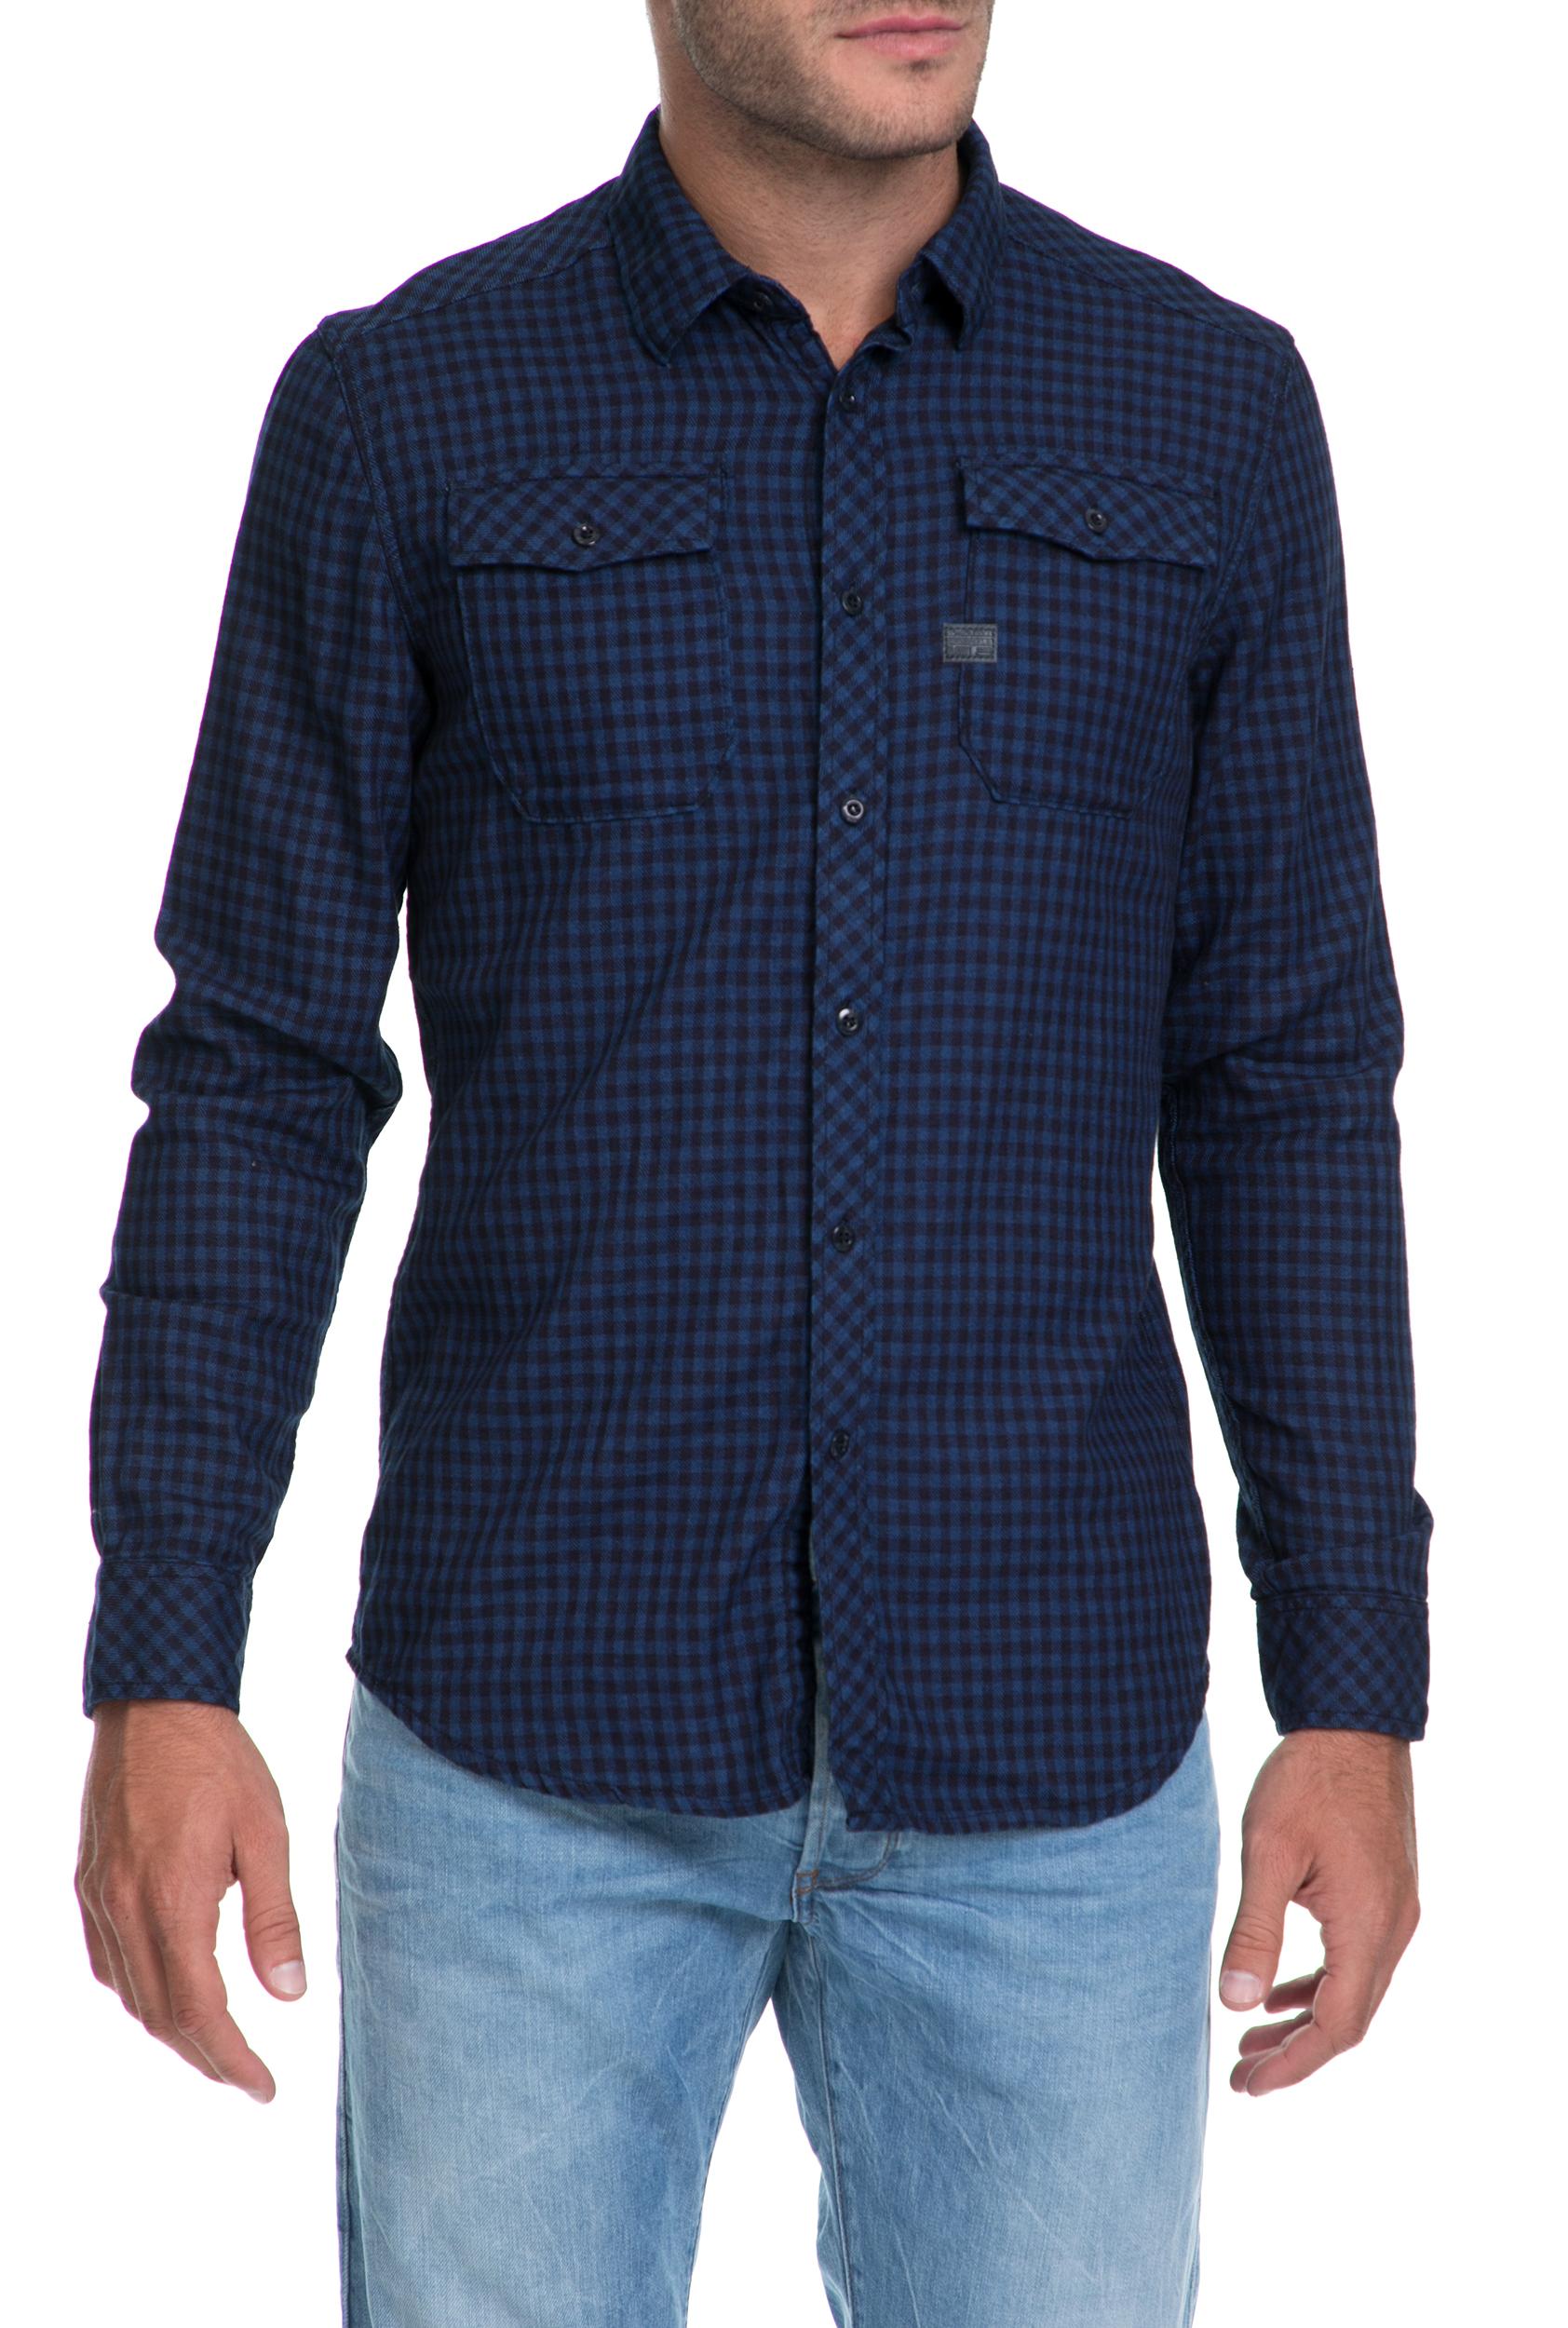 G-STAR - Ανδρικό πουκάμισο Landoh G-STAR RAW μπλε ανδρικά ρούχα πουκάμισα μακρυμάνικα